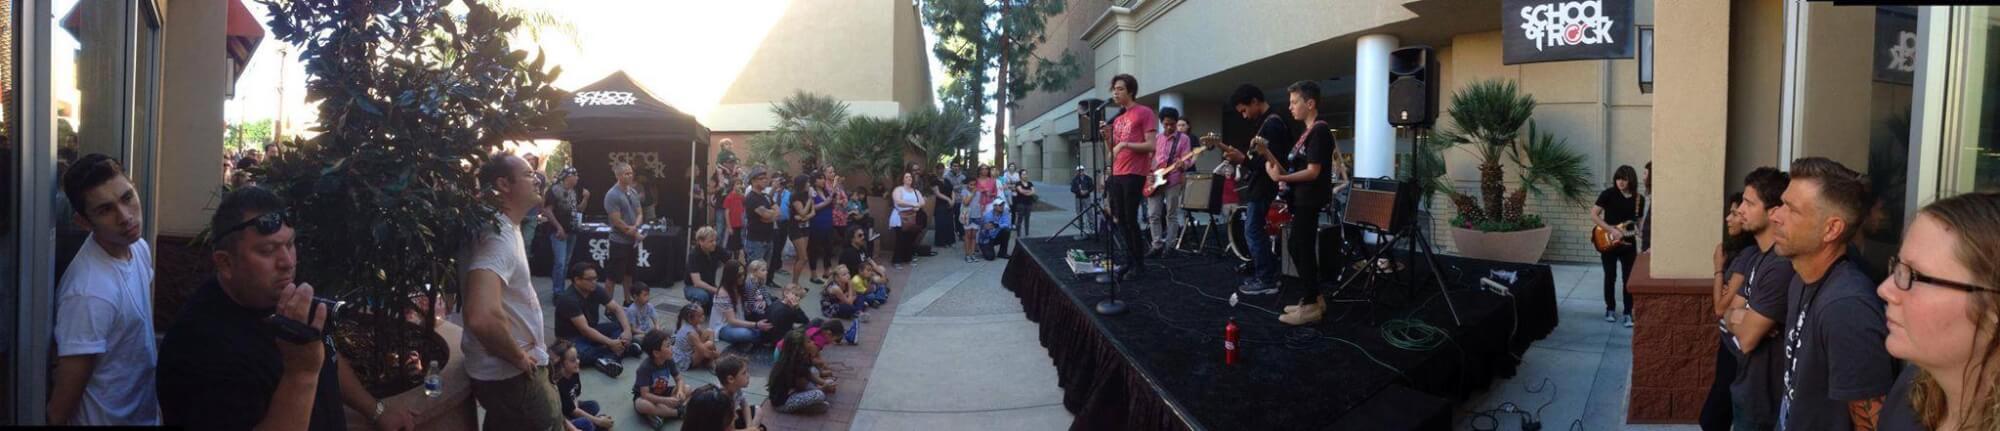 Grand Opening with School of Rock Burbank kids